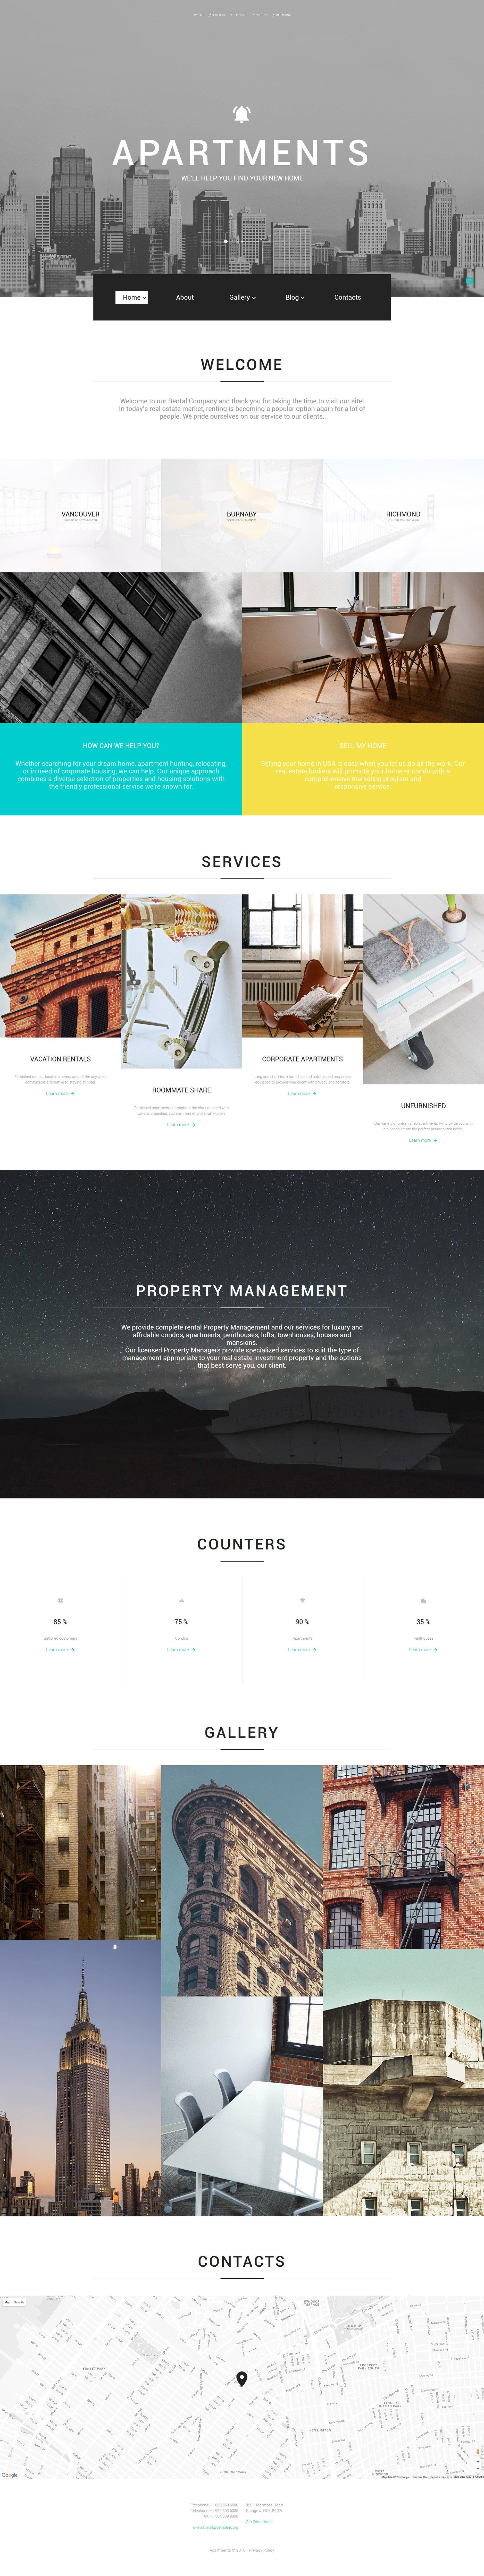 """Appartements"" modèle web adaptatif #58726 - screenshot"